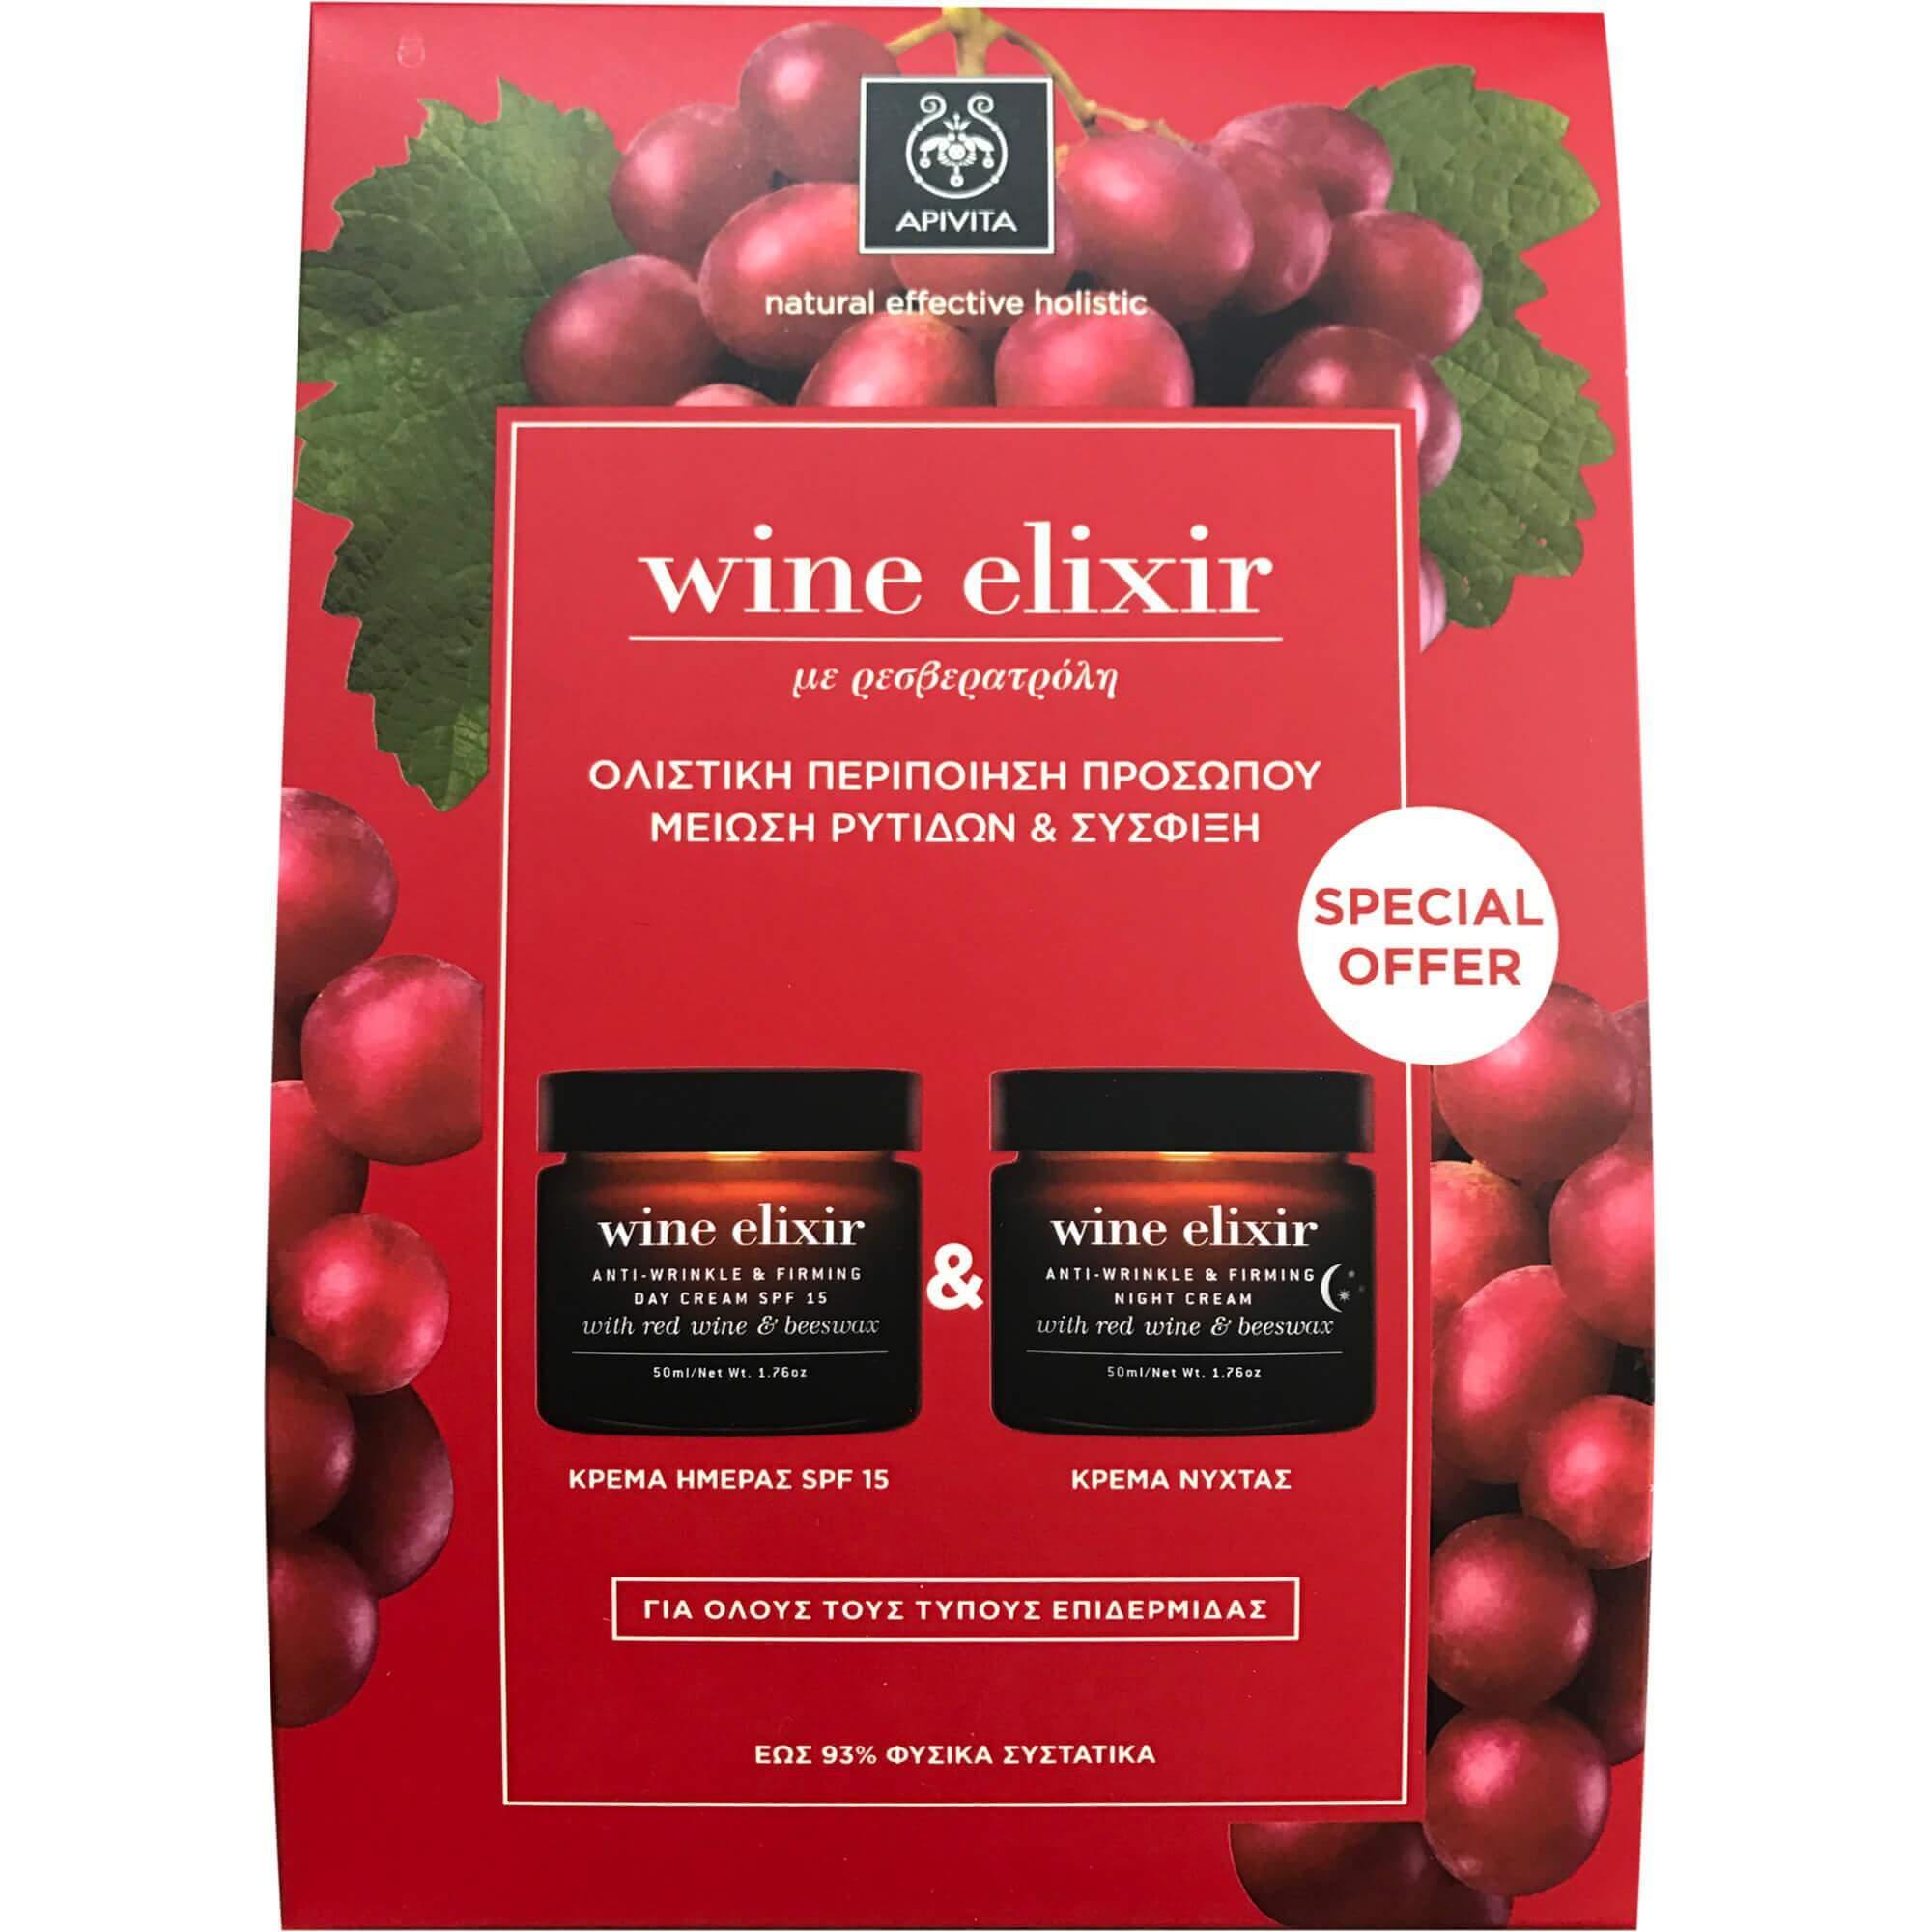 Apivita Πακέτο Προσφοράς Wine Elixir Αντιρυτιδική & Συσφιγκτική Κρέμα Ημέρας Spf15 50ml & ΔώροΚρέμα Νύχτας50ml